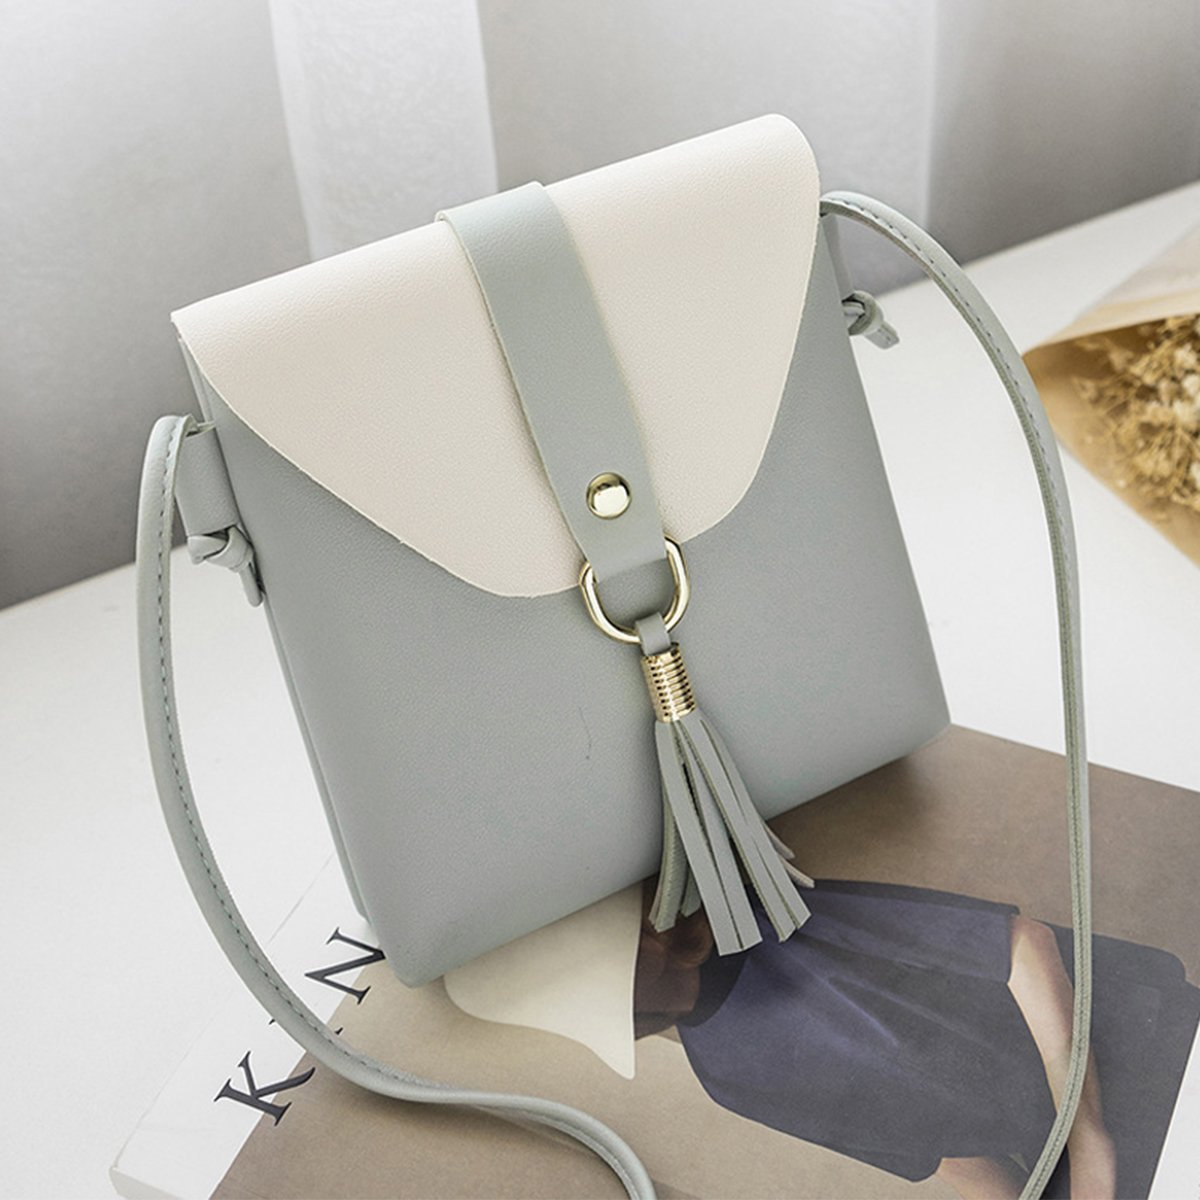 Evaliana Women Office Work Handbag Shoulder Bag Messenger Tote PU Leather Purse Satchel